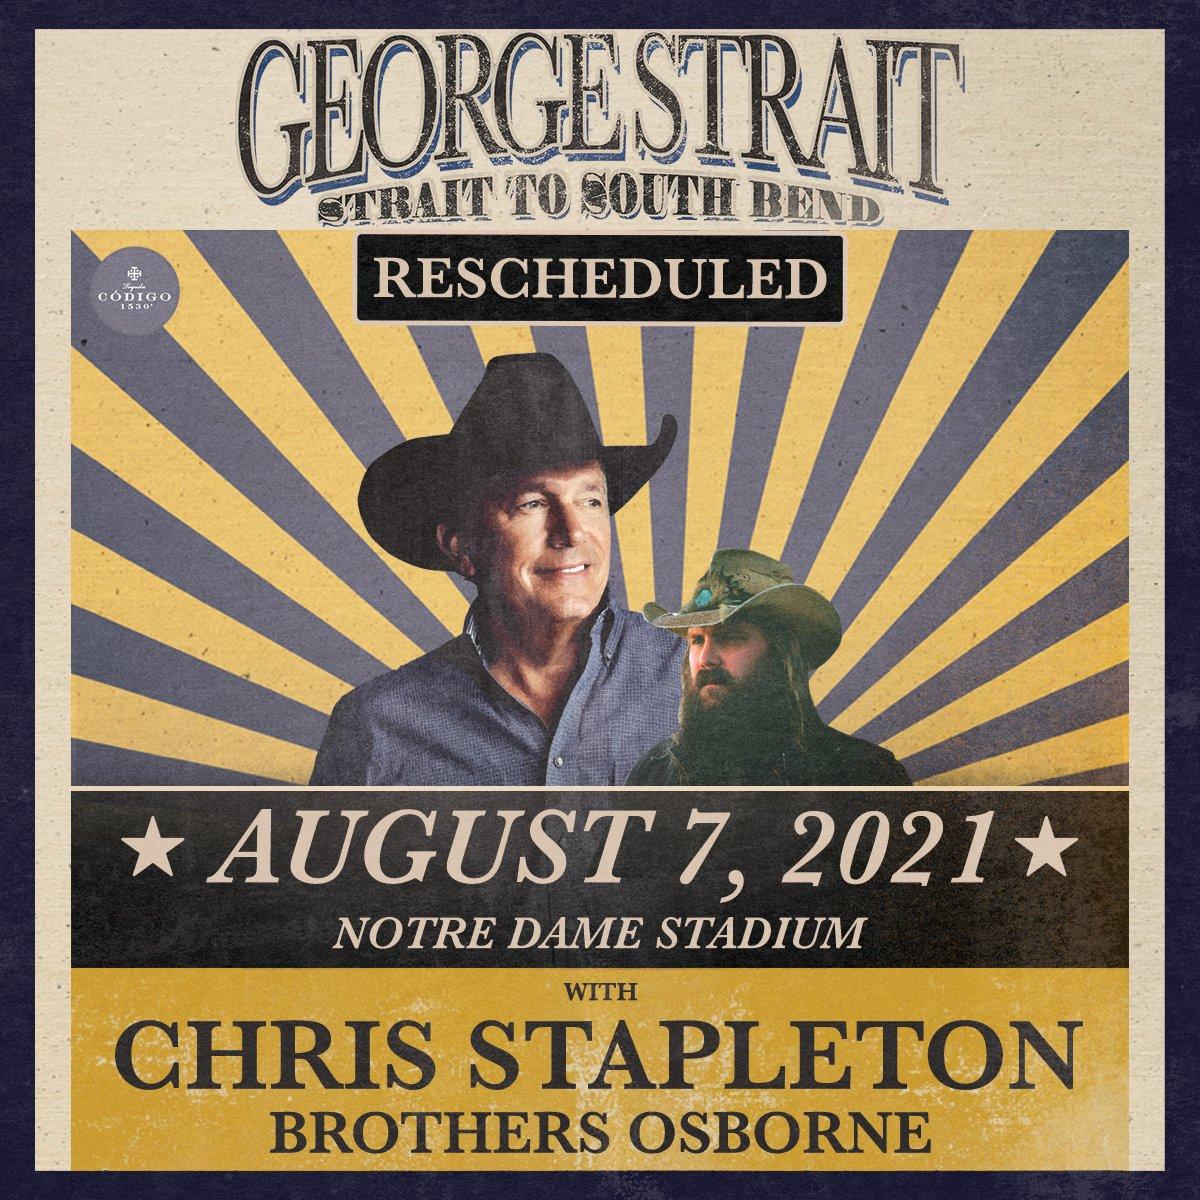 George Strait postpones Notre Dame Stadium concert to 2021 go.nd.edu/e7eece